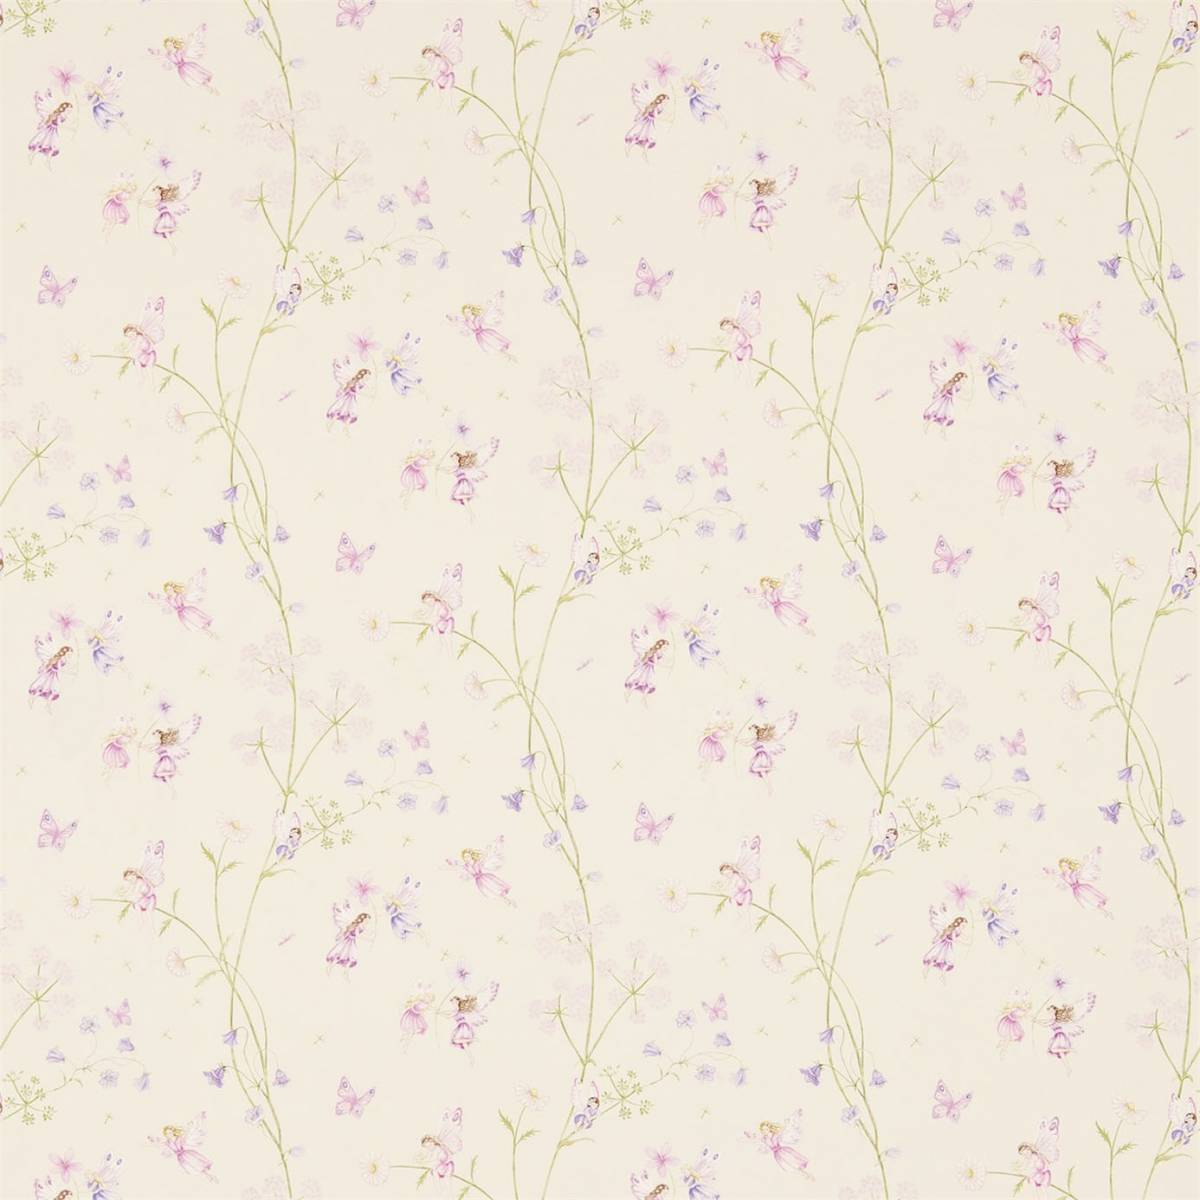 fairyland fabric calico 223922 sanderson abracazoo. Black Bedroom Furniture Sets. Home Design Ideas